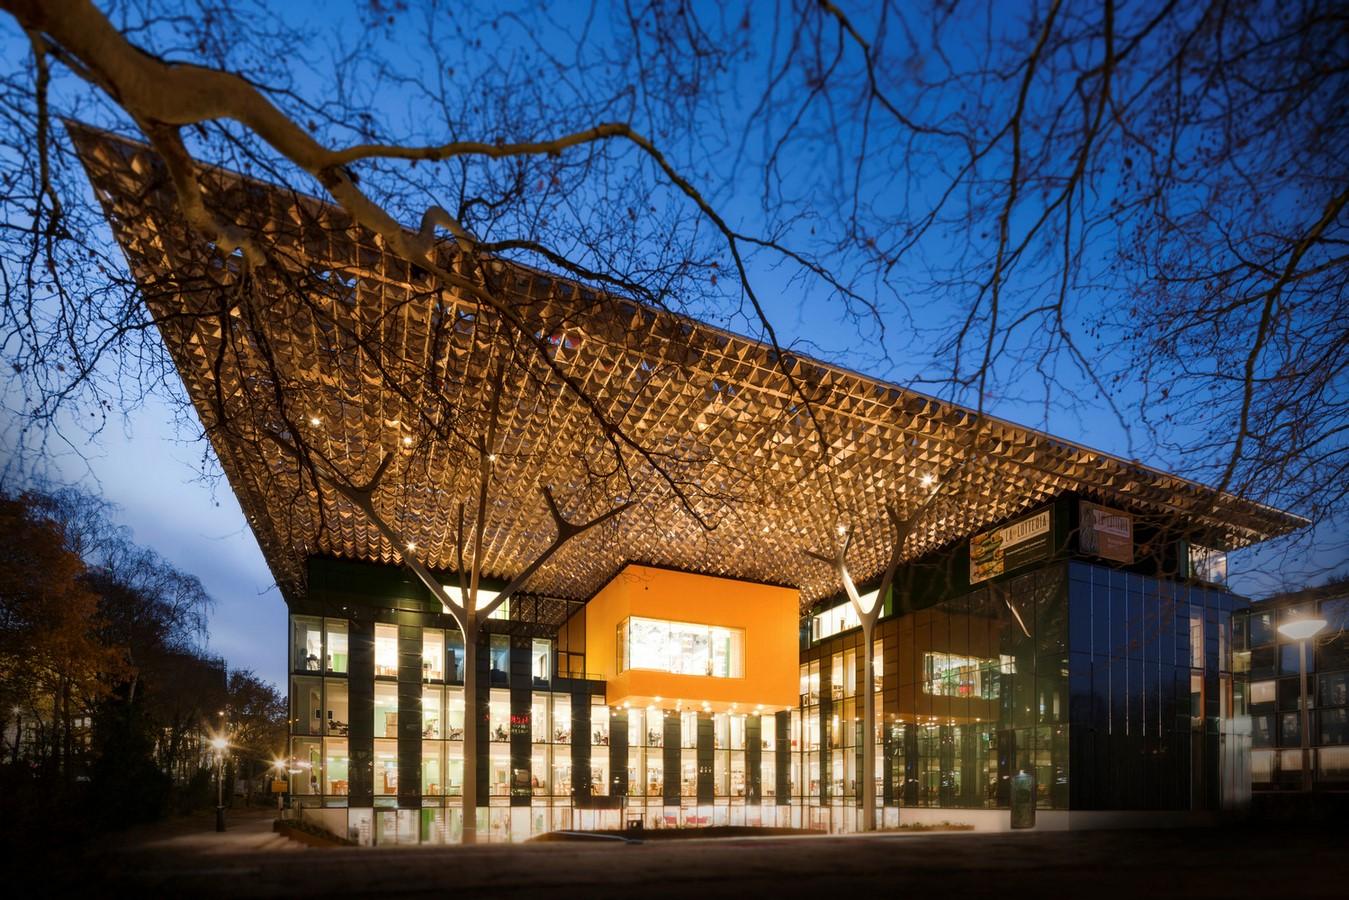 Goede Doelen Loterijen & Dutch Charity Lotteries Head Offices by Benthem Crouwel Architects: Under one roof - Sheet2